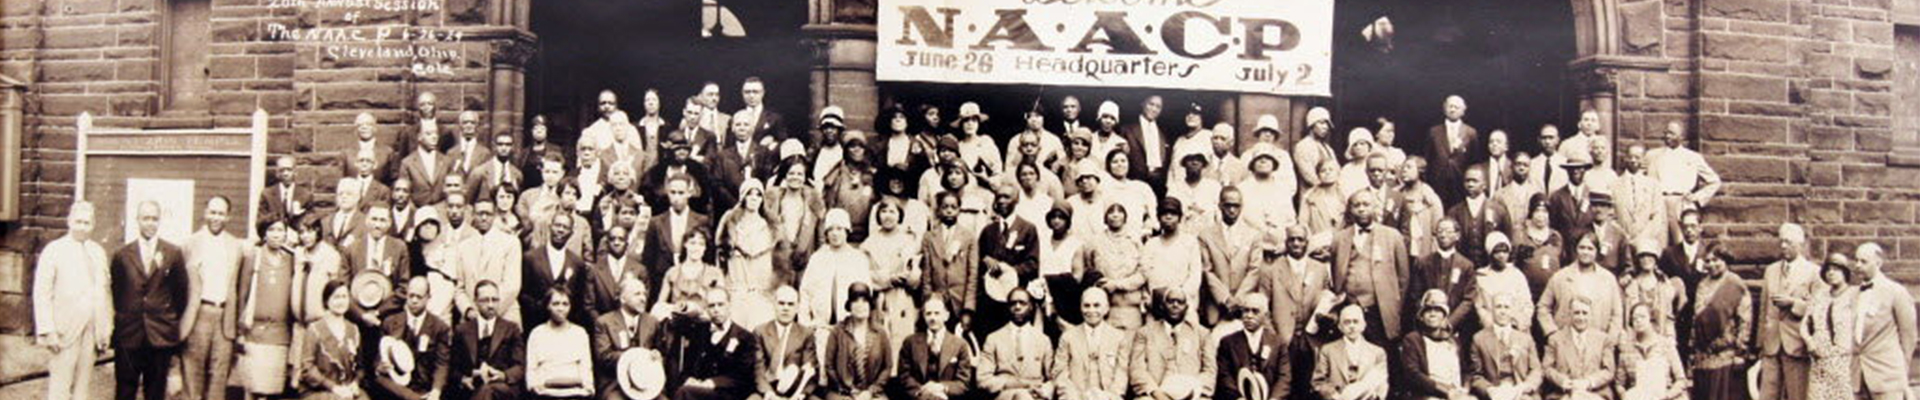 NAACP history banner